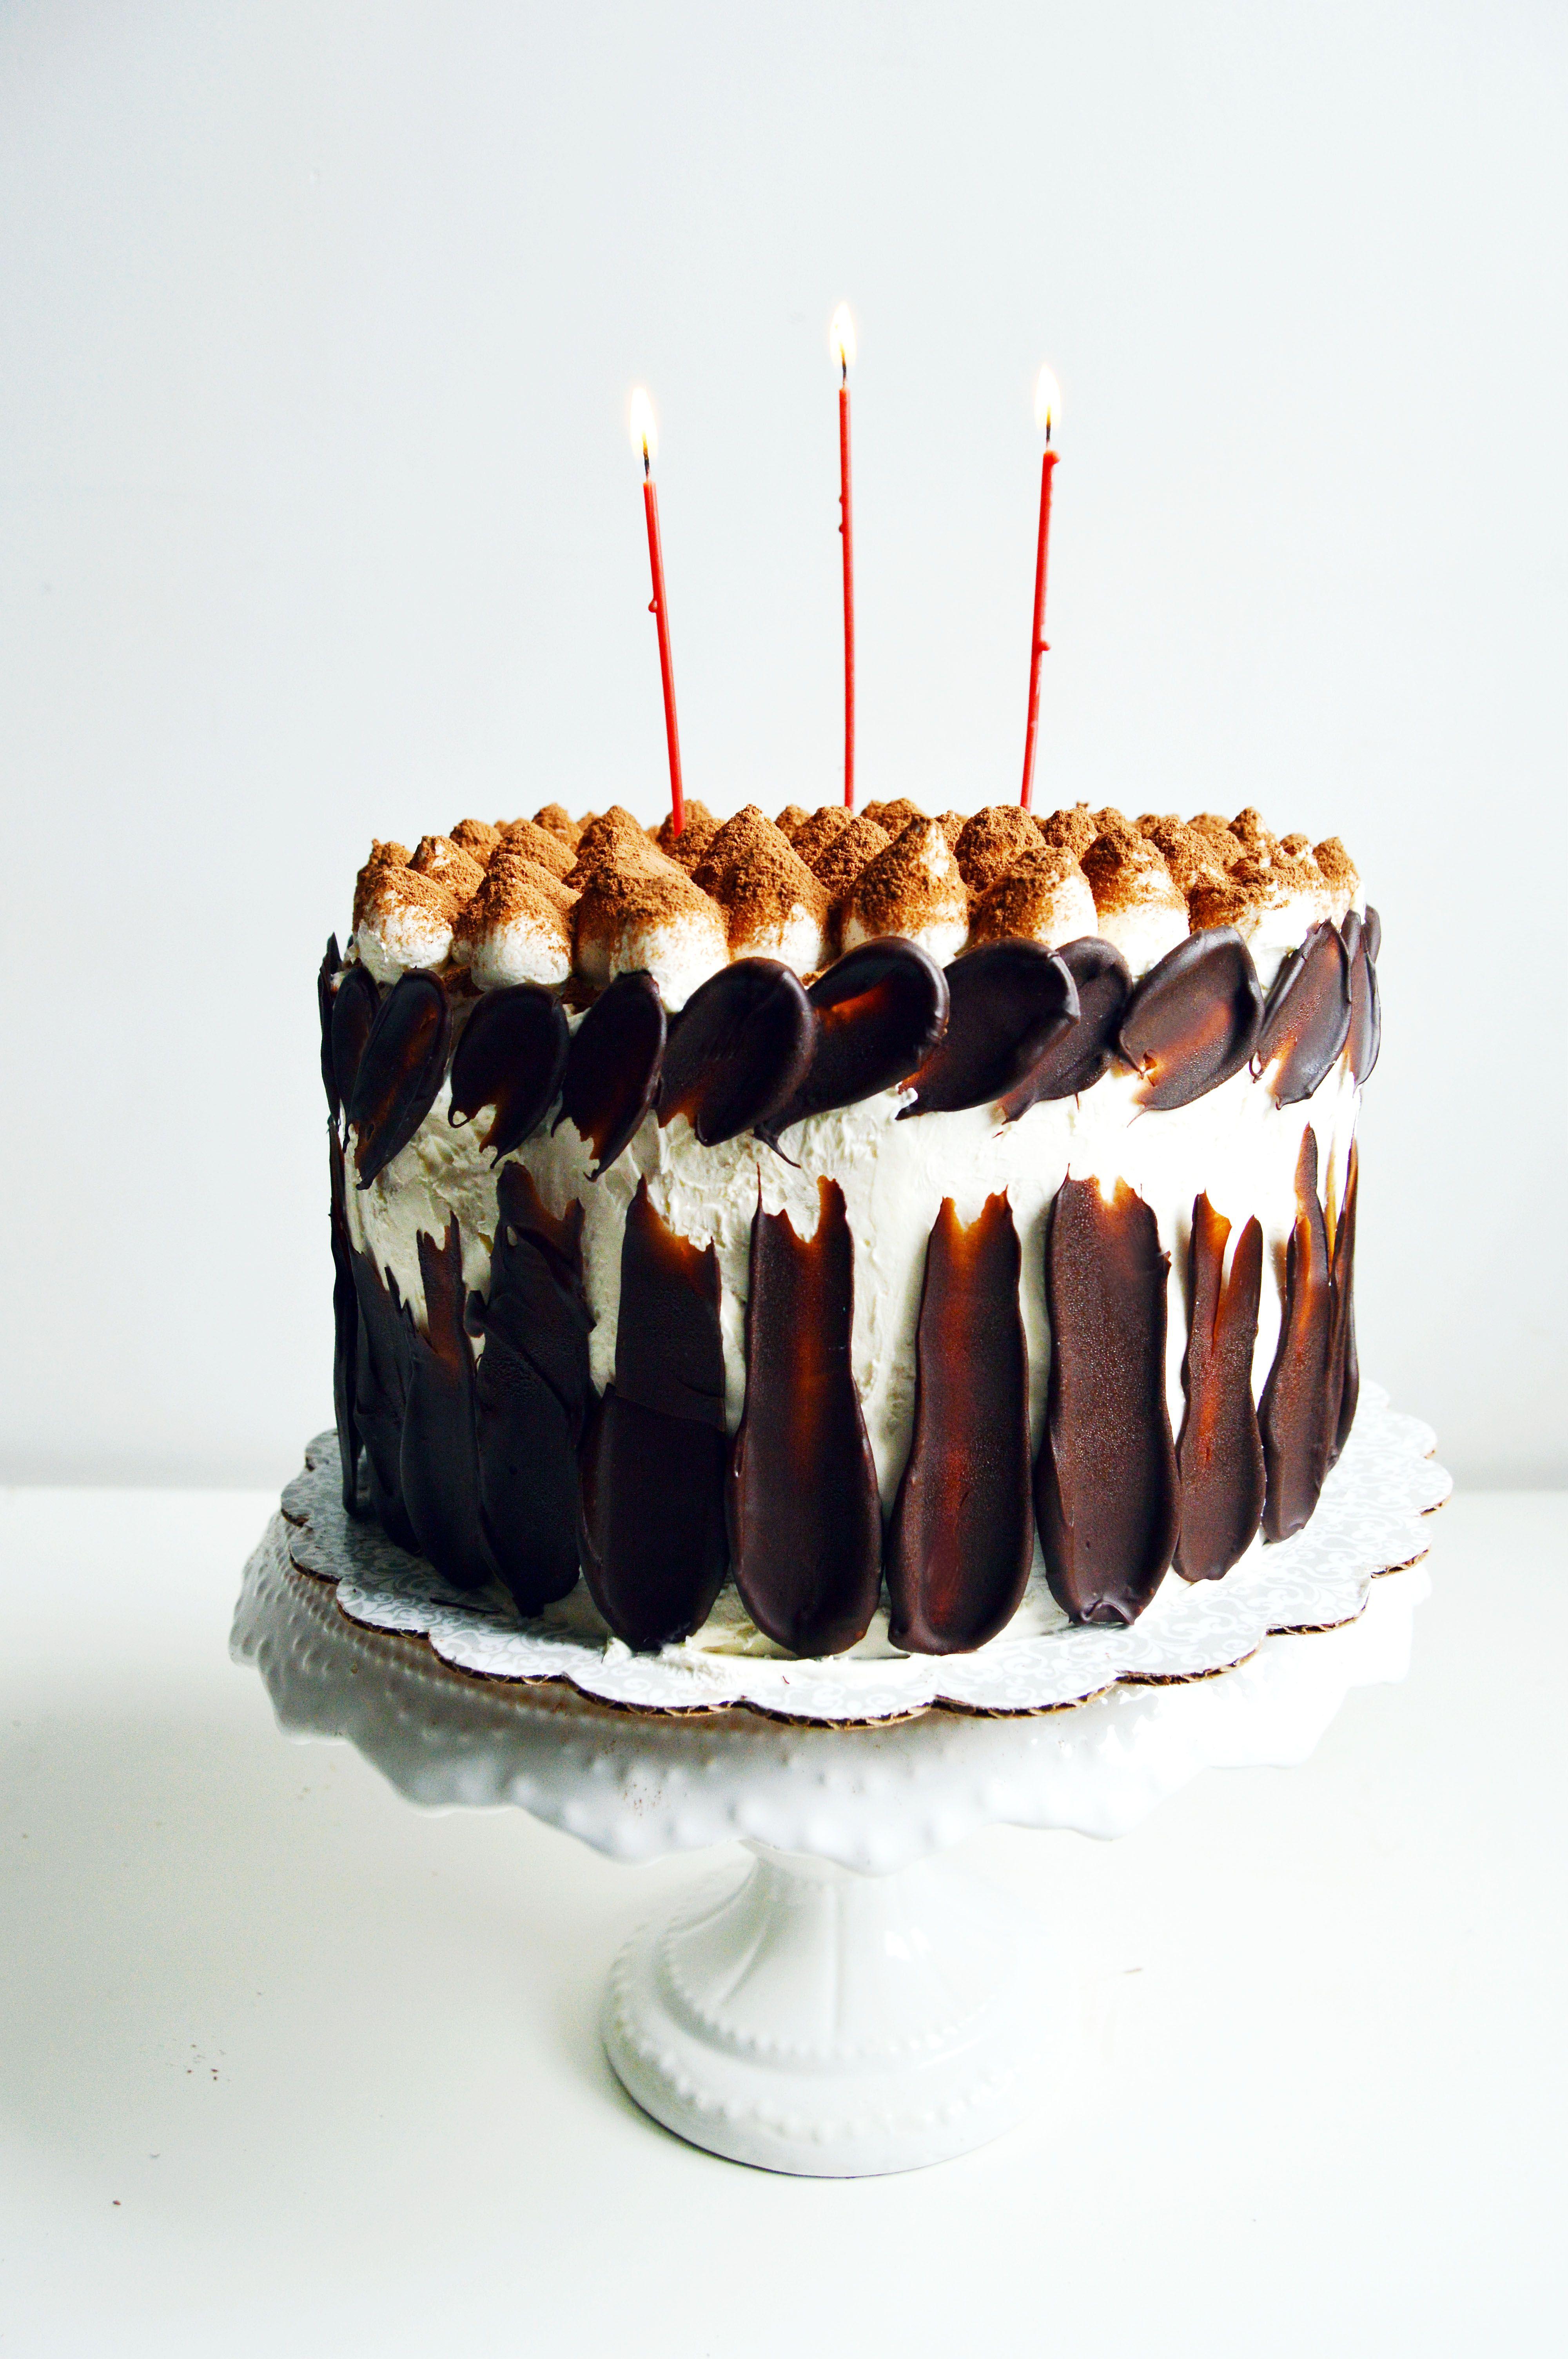 Tiramisu Crunch Ice Cream Cake Cakes and Cupcakes Pinterest